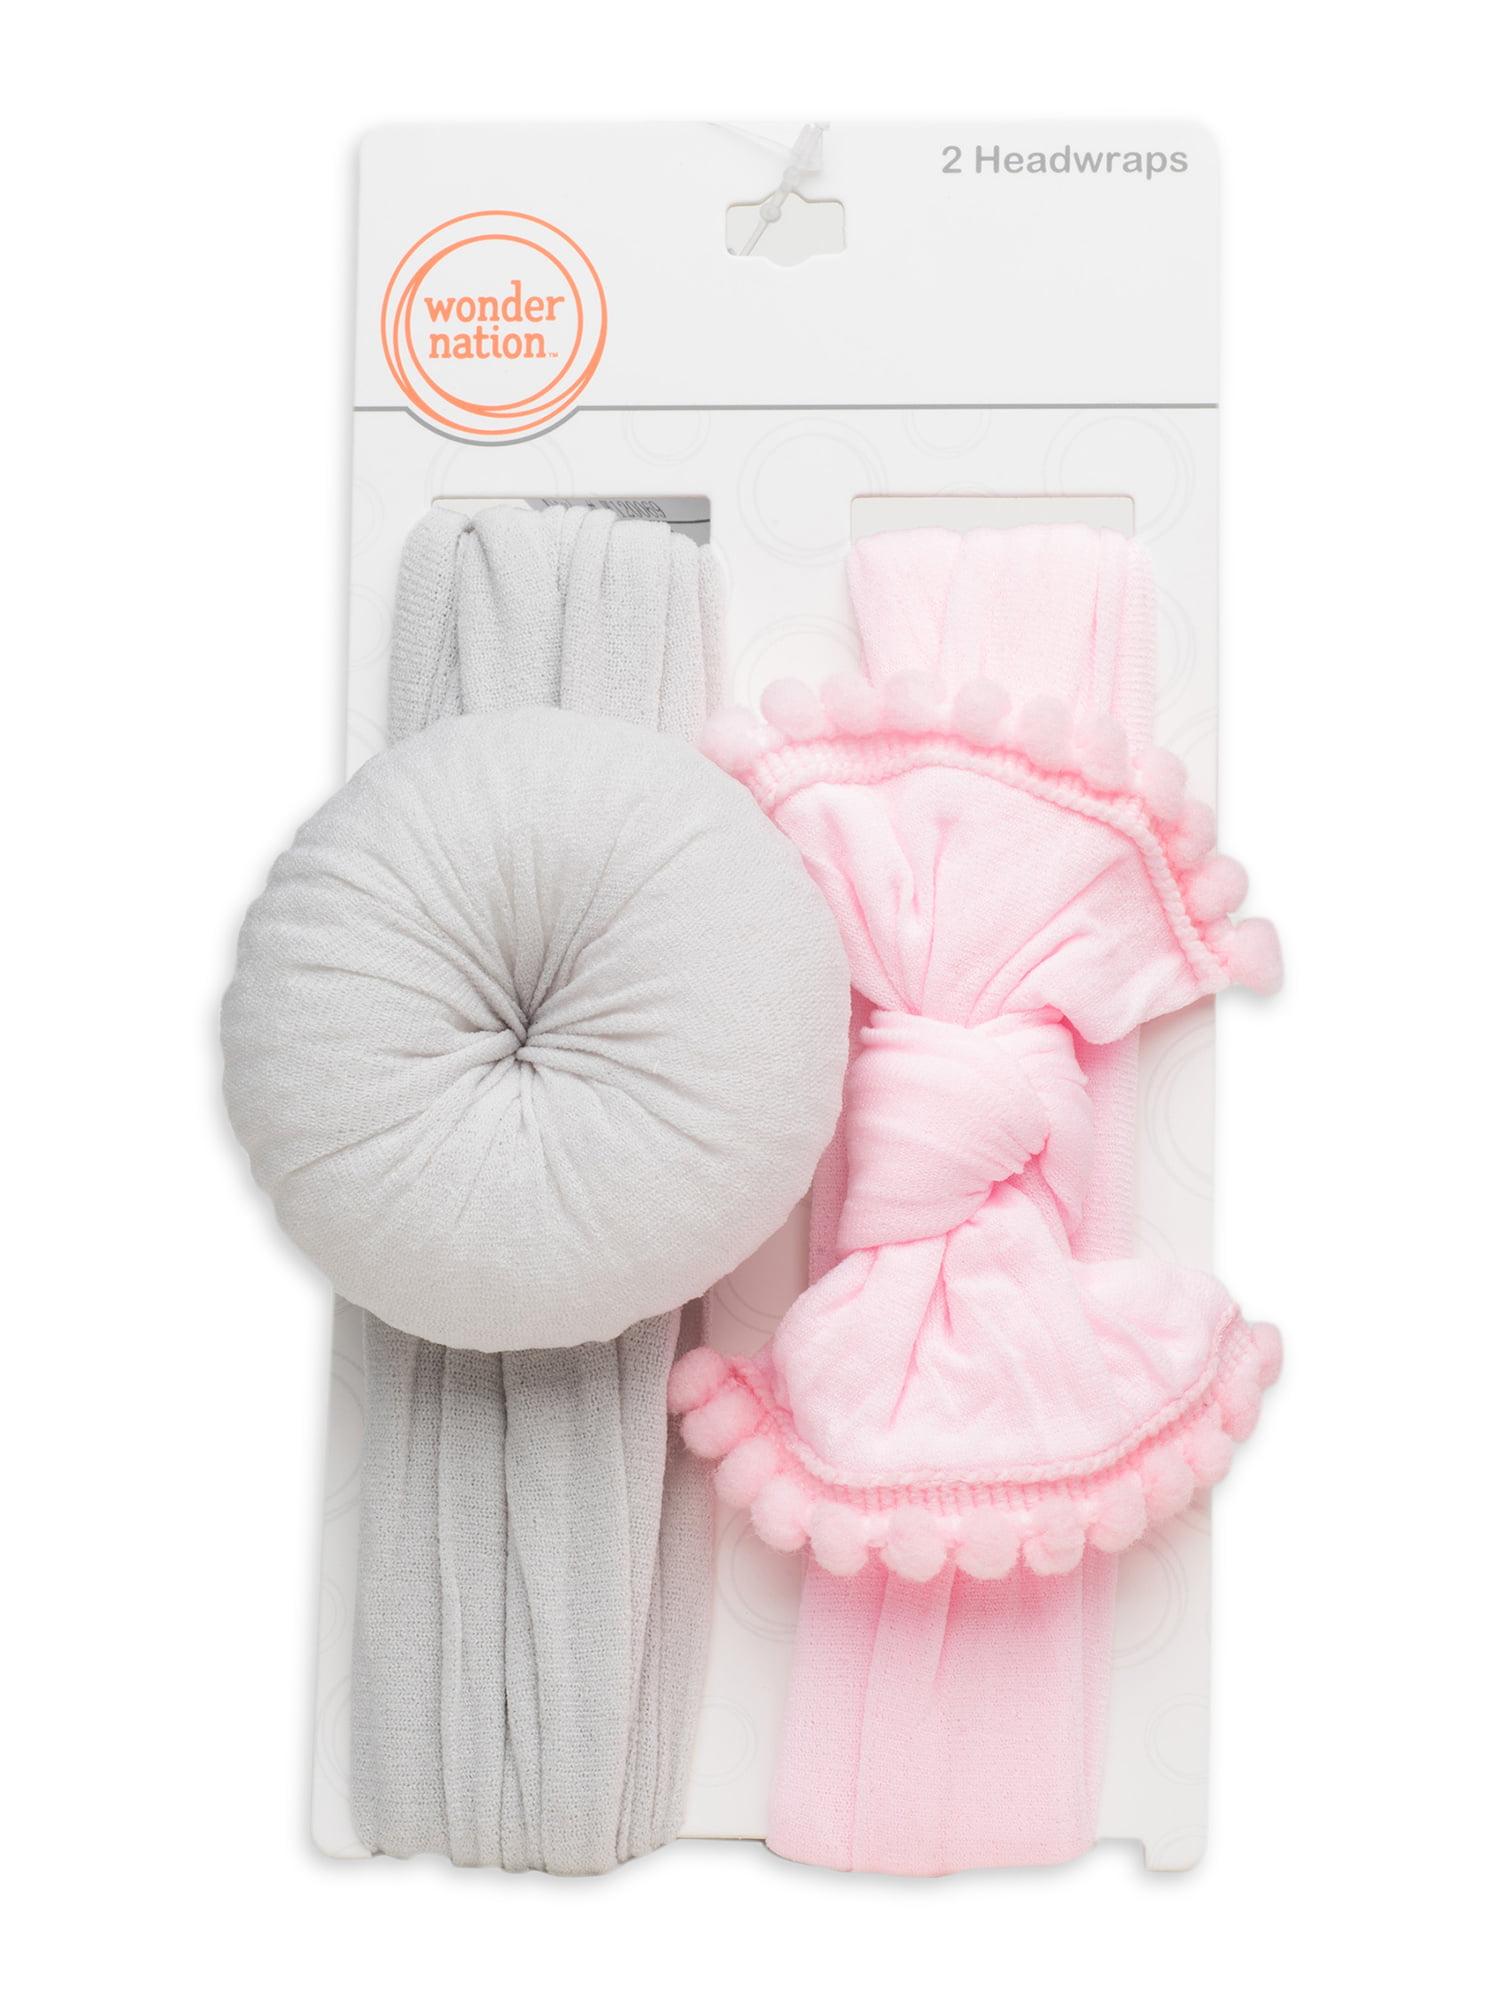 Donut Headwrap Bow